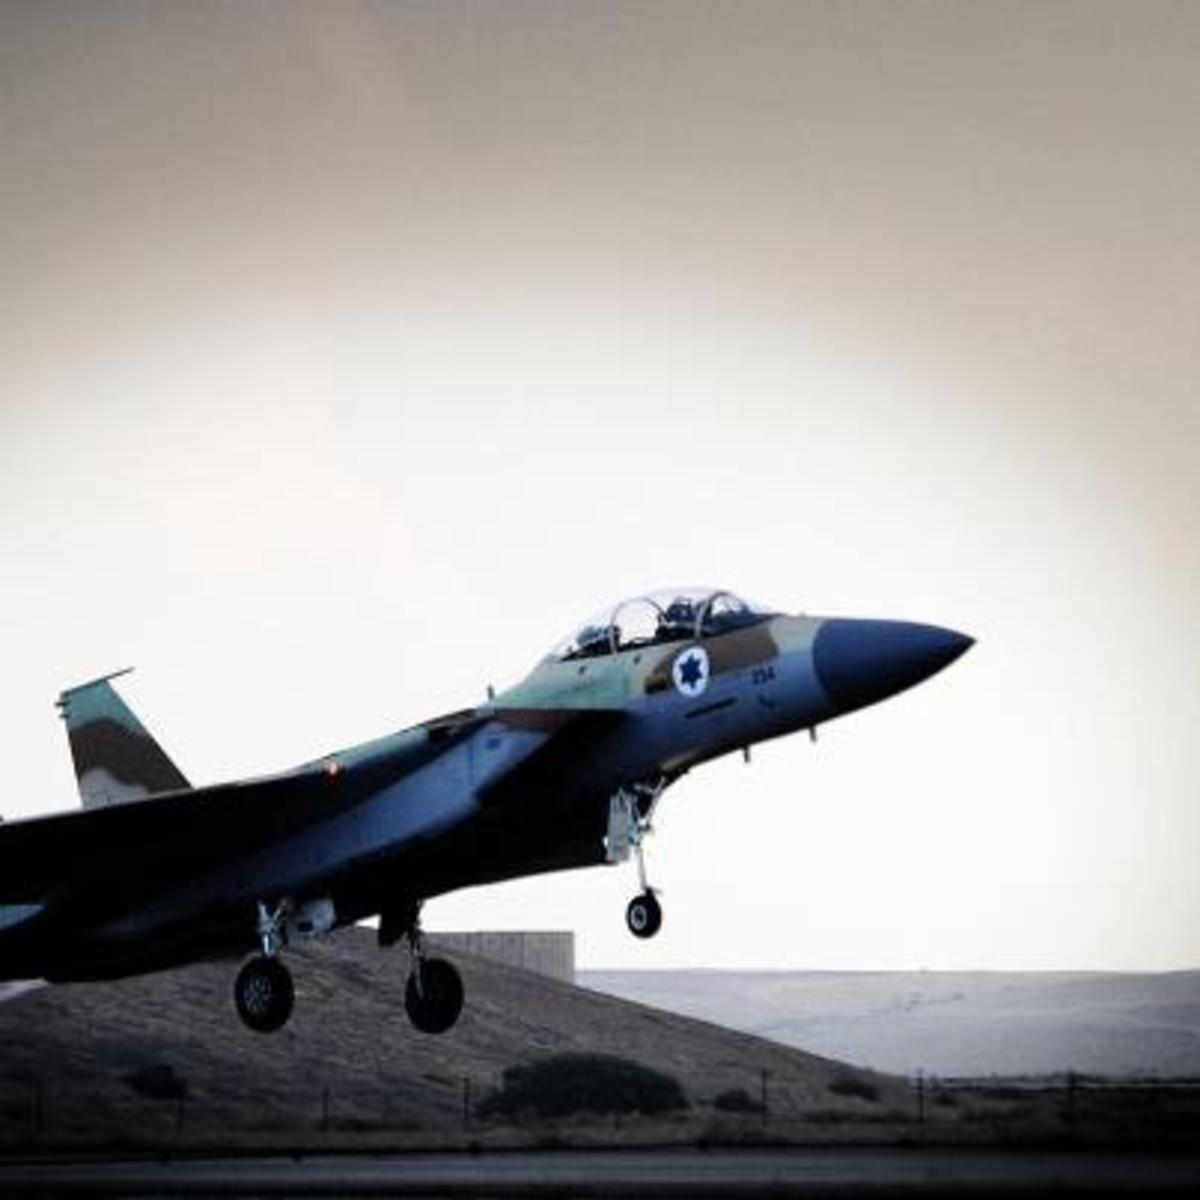 Israel Jet Surveillance Flight Takeoff